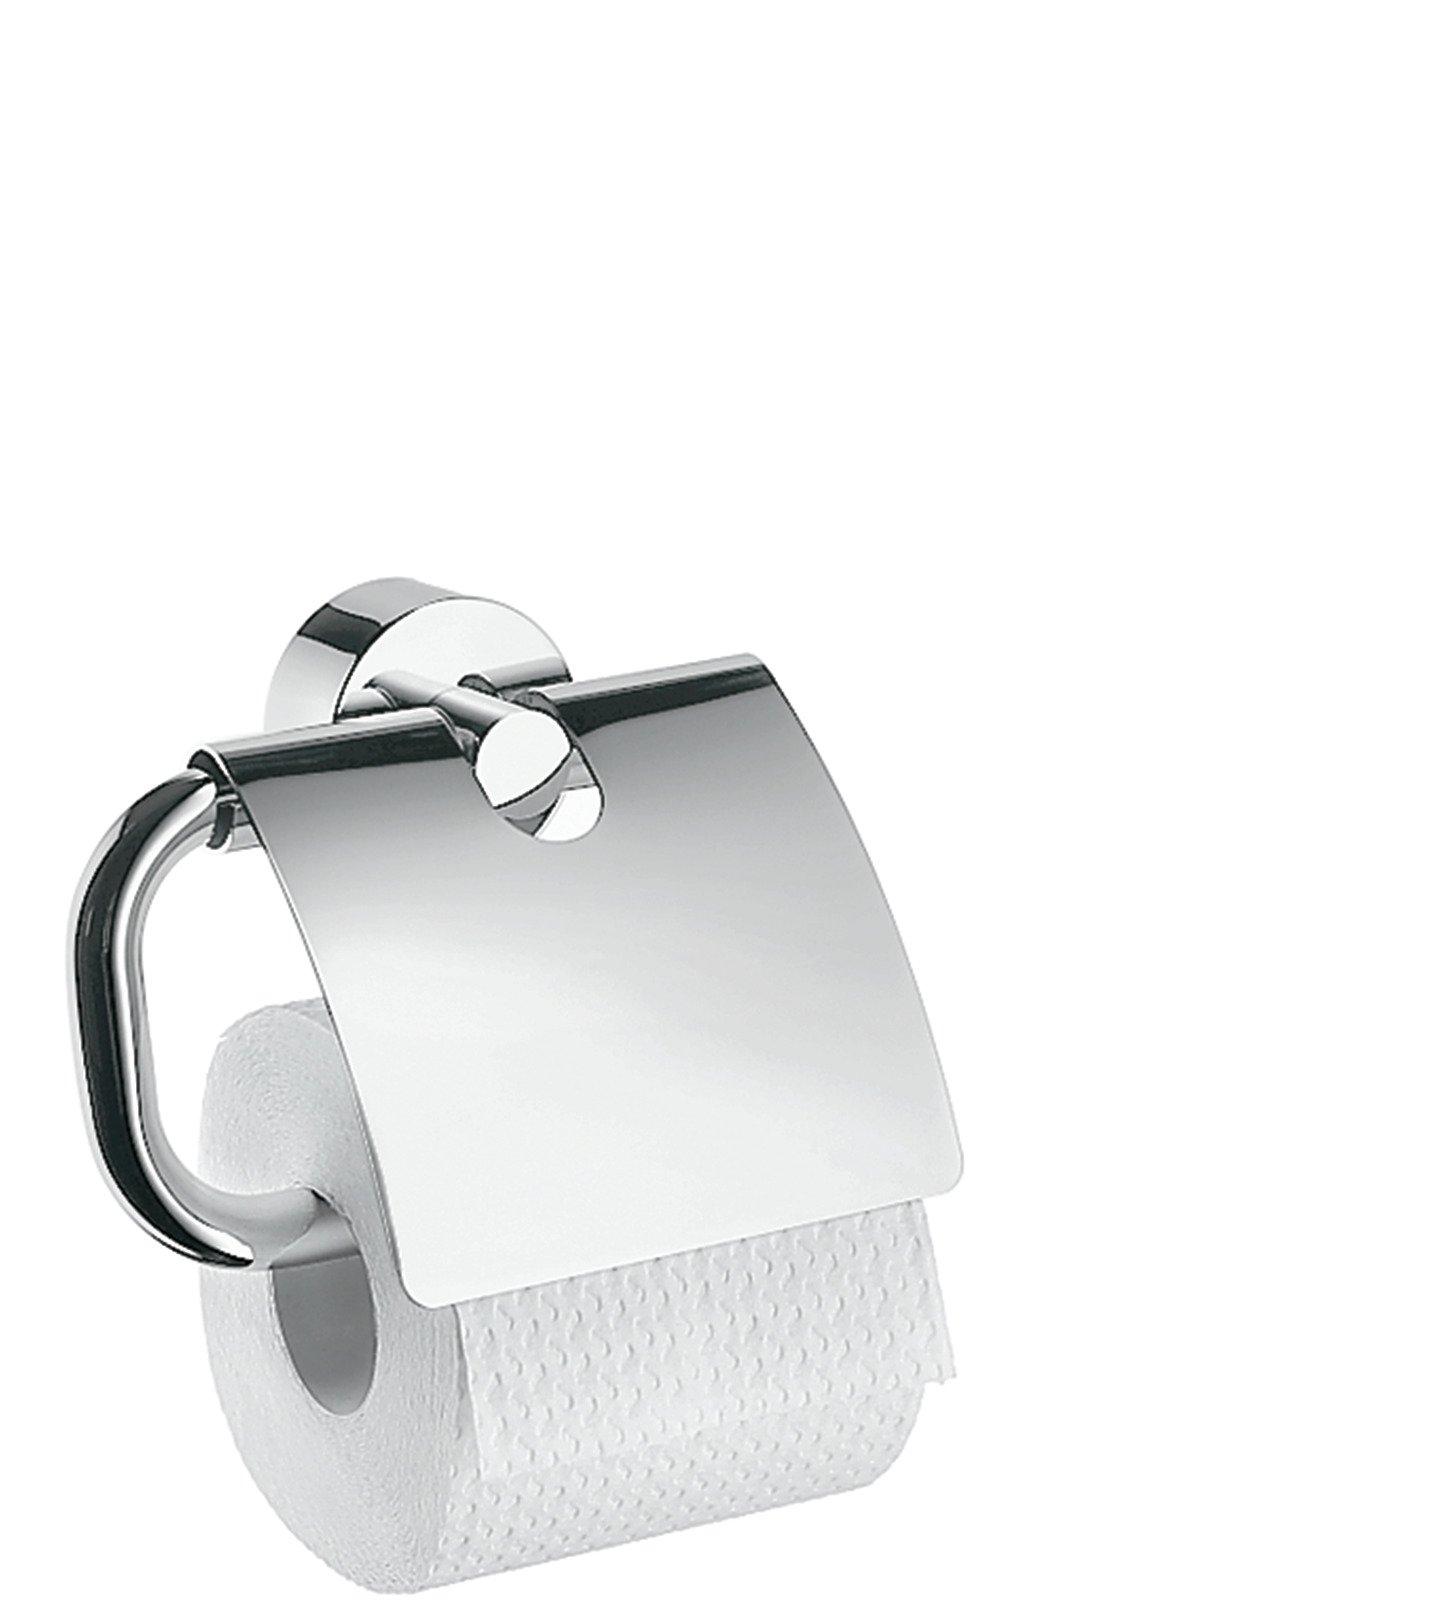 Axor 41538000 Uno Toilet Paper Holder, Chrome